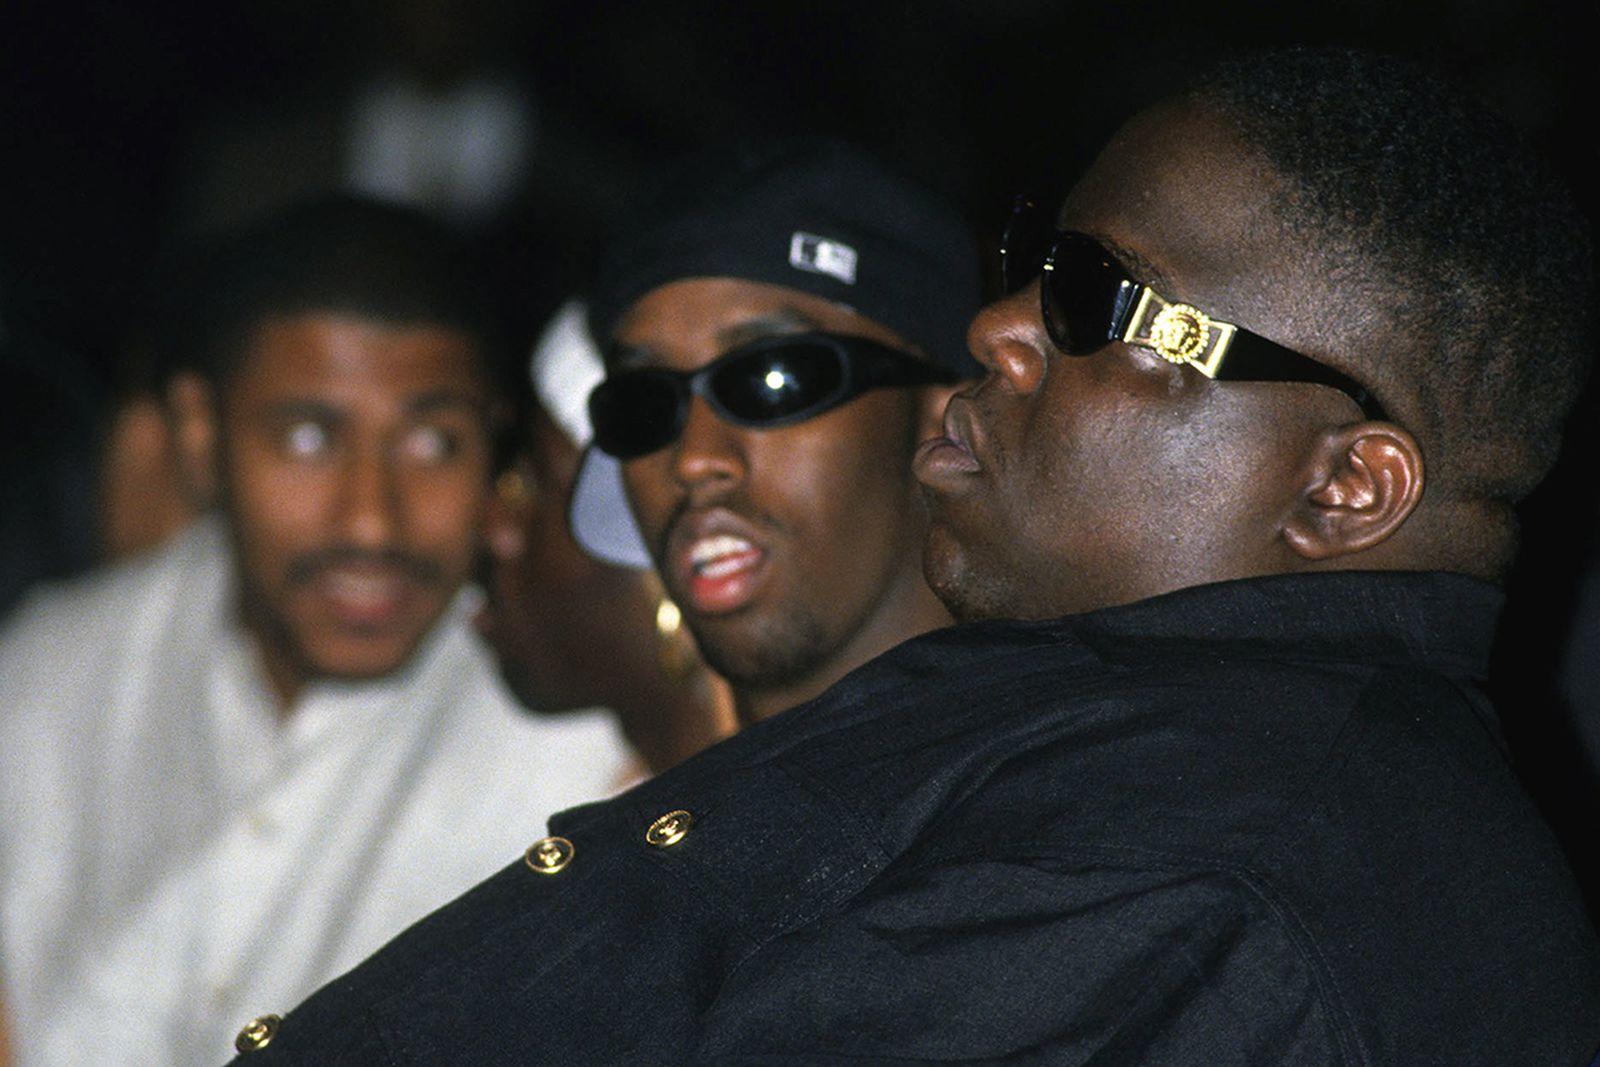 Puff Daddy Notorious BIG Versace sunglasses